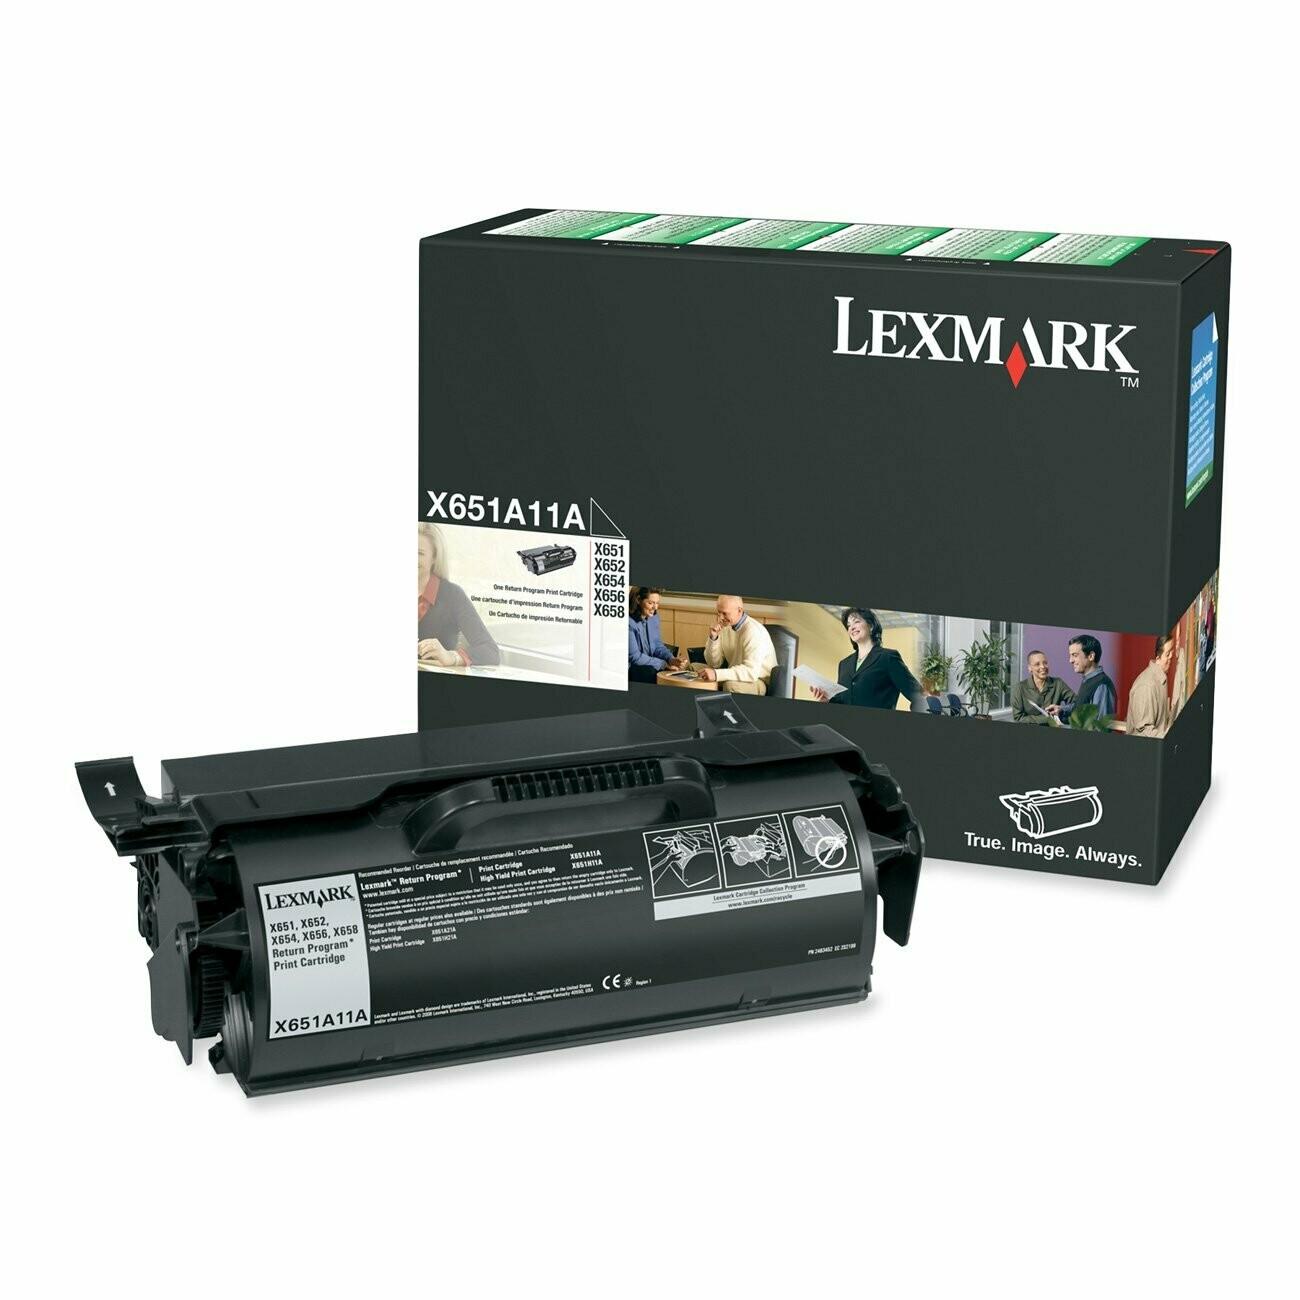 Lexmark / X651A11A Black Original LaserJet Toner Cartridge